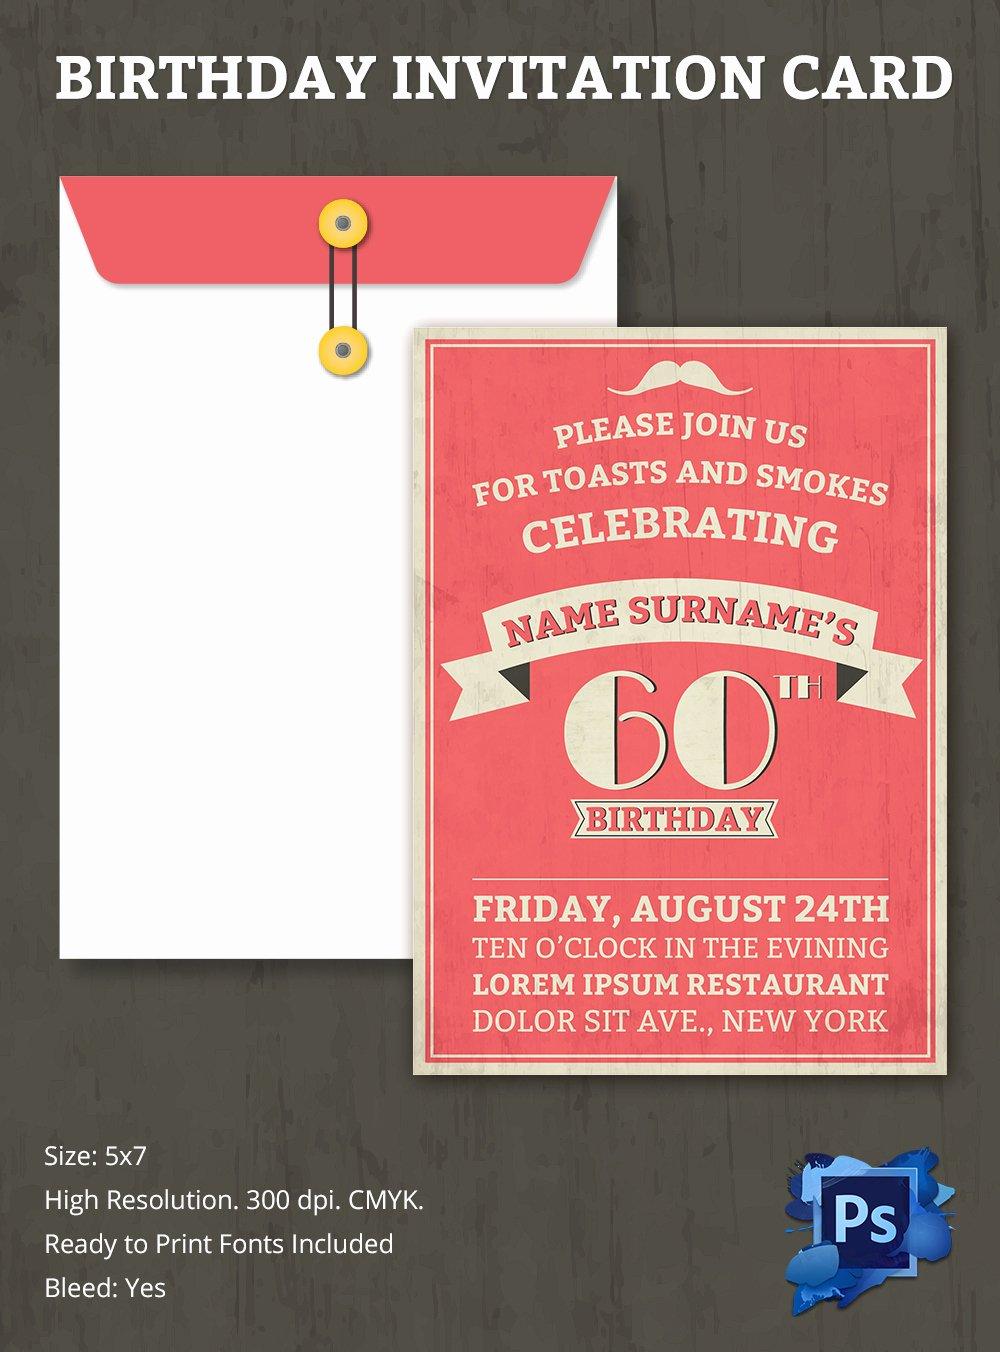 Birthday Invitation Templates Word Inspirational Birthday Invitation Templates Word Free